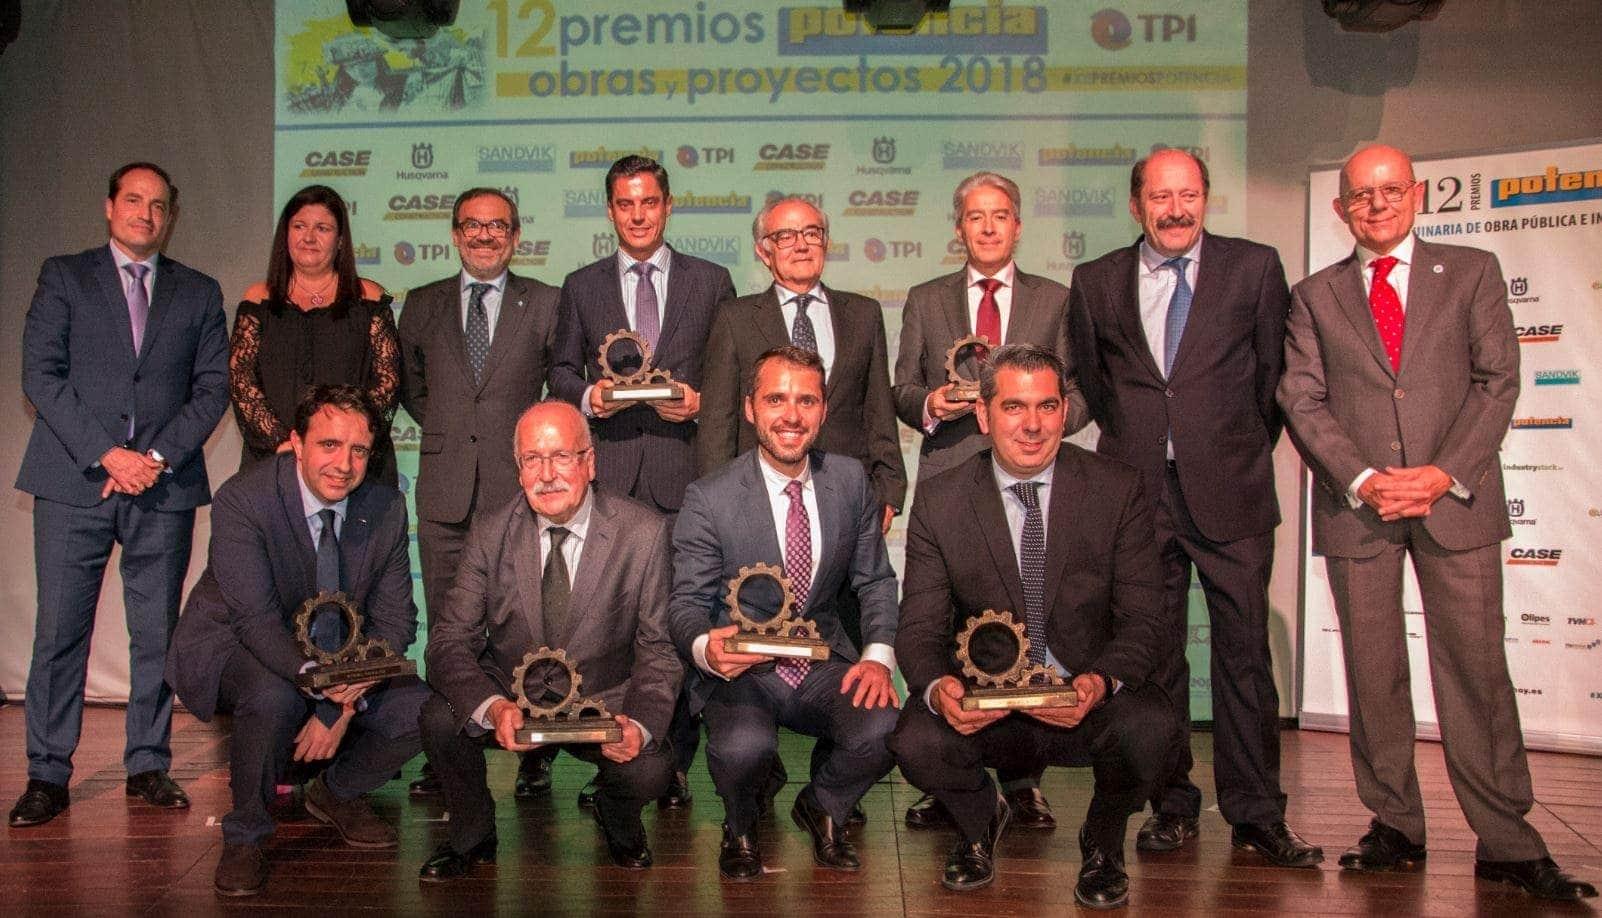 premiados premios Erques 2018